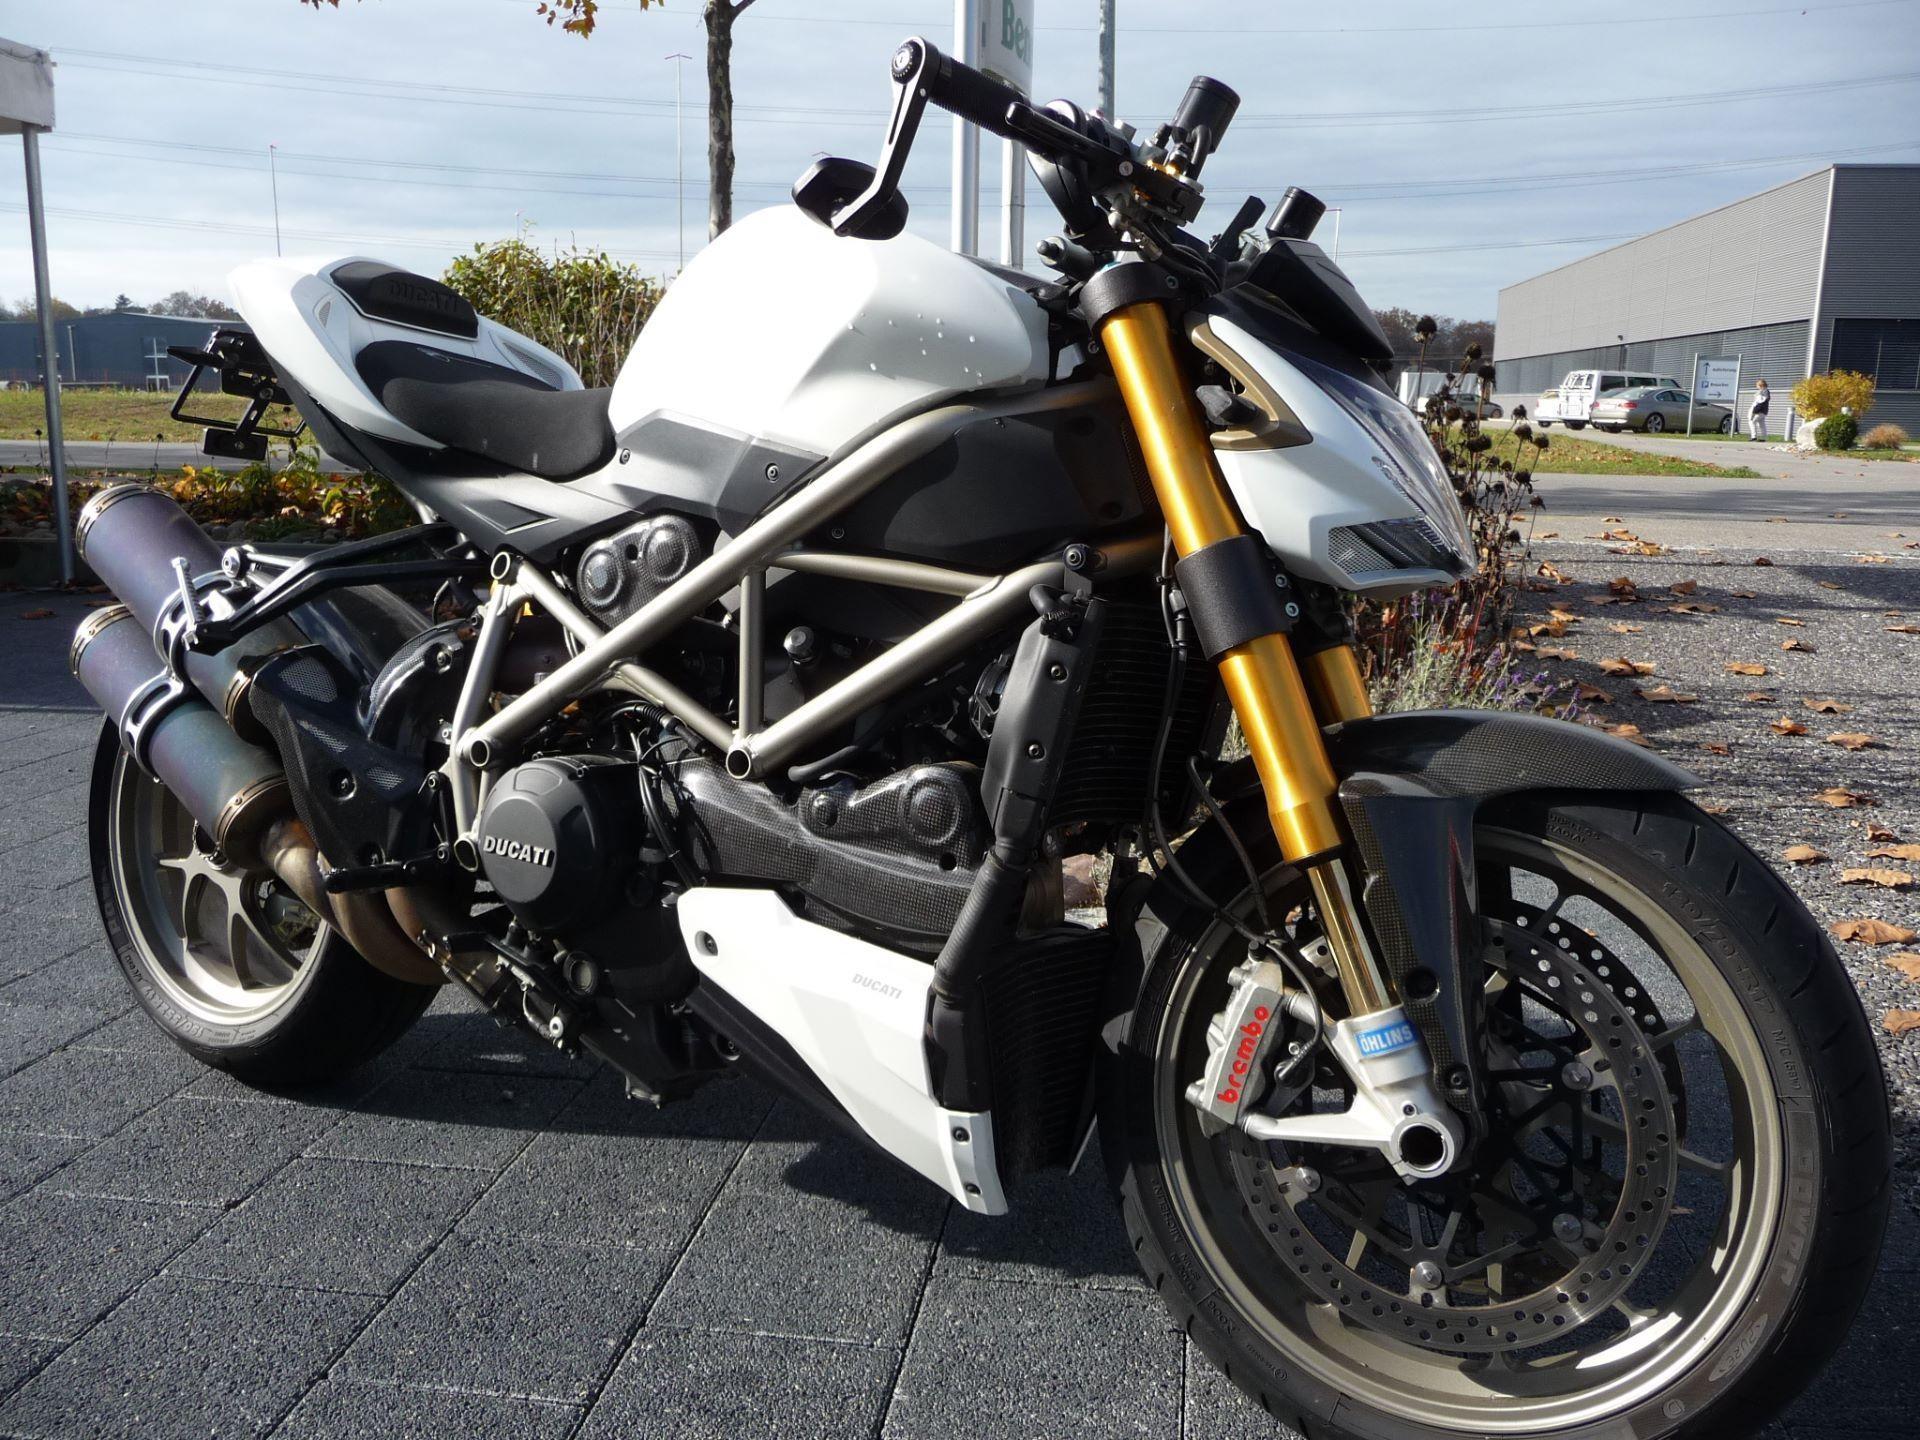 motorrad occasion kaufen ducati 1098 streetfighter s moto. Black Bedroom Furniture Sets. Home Design Ideas